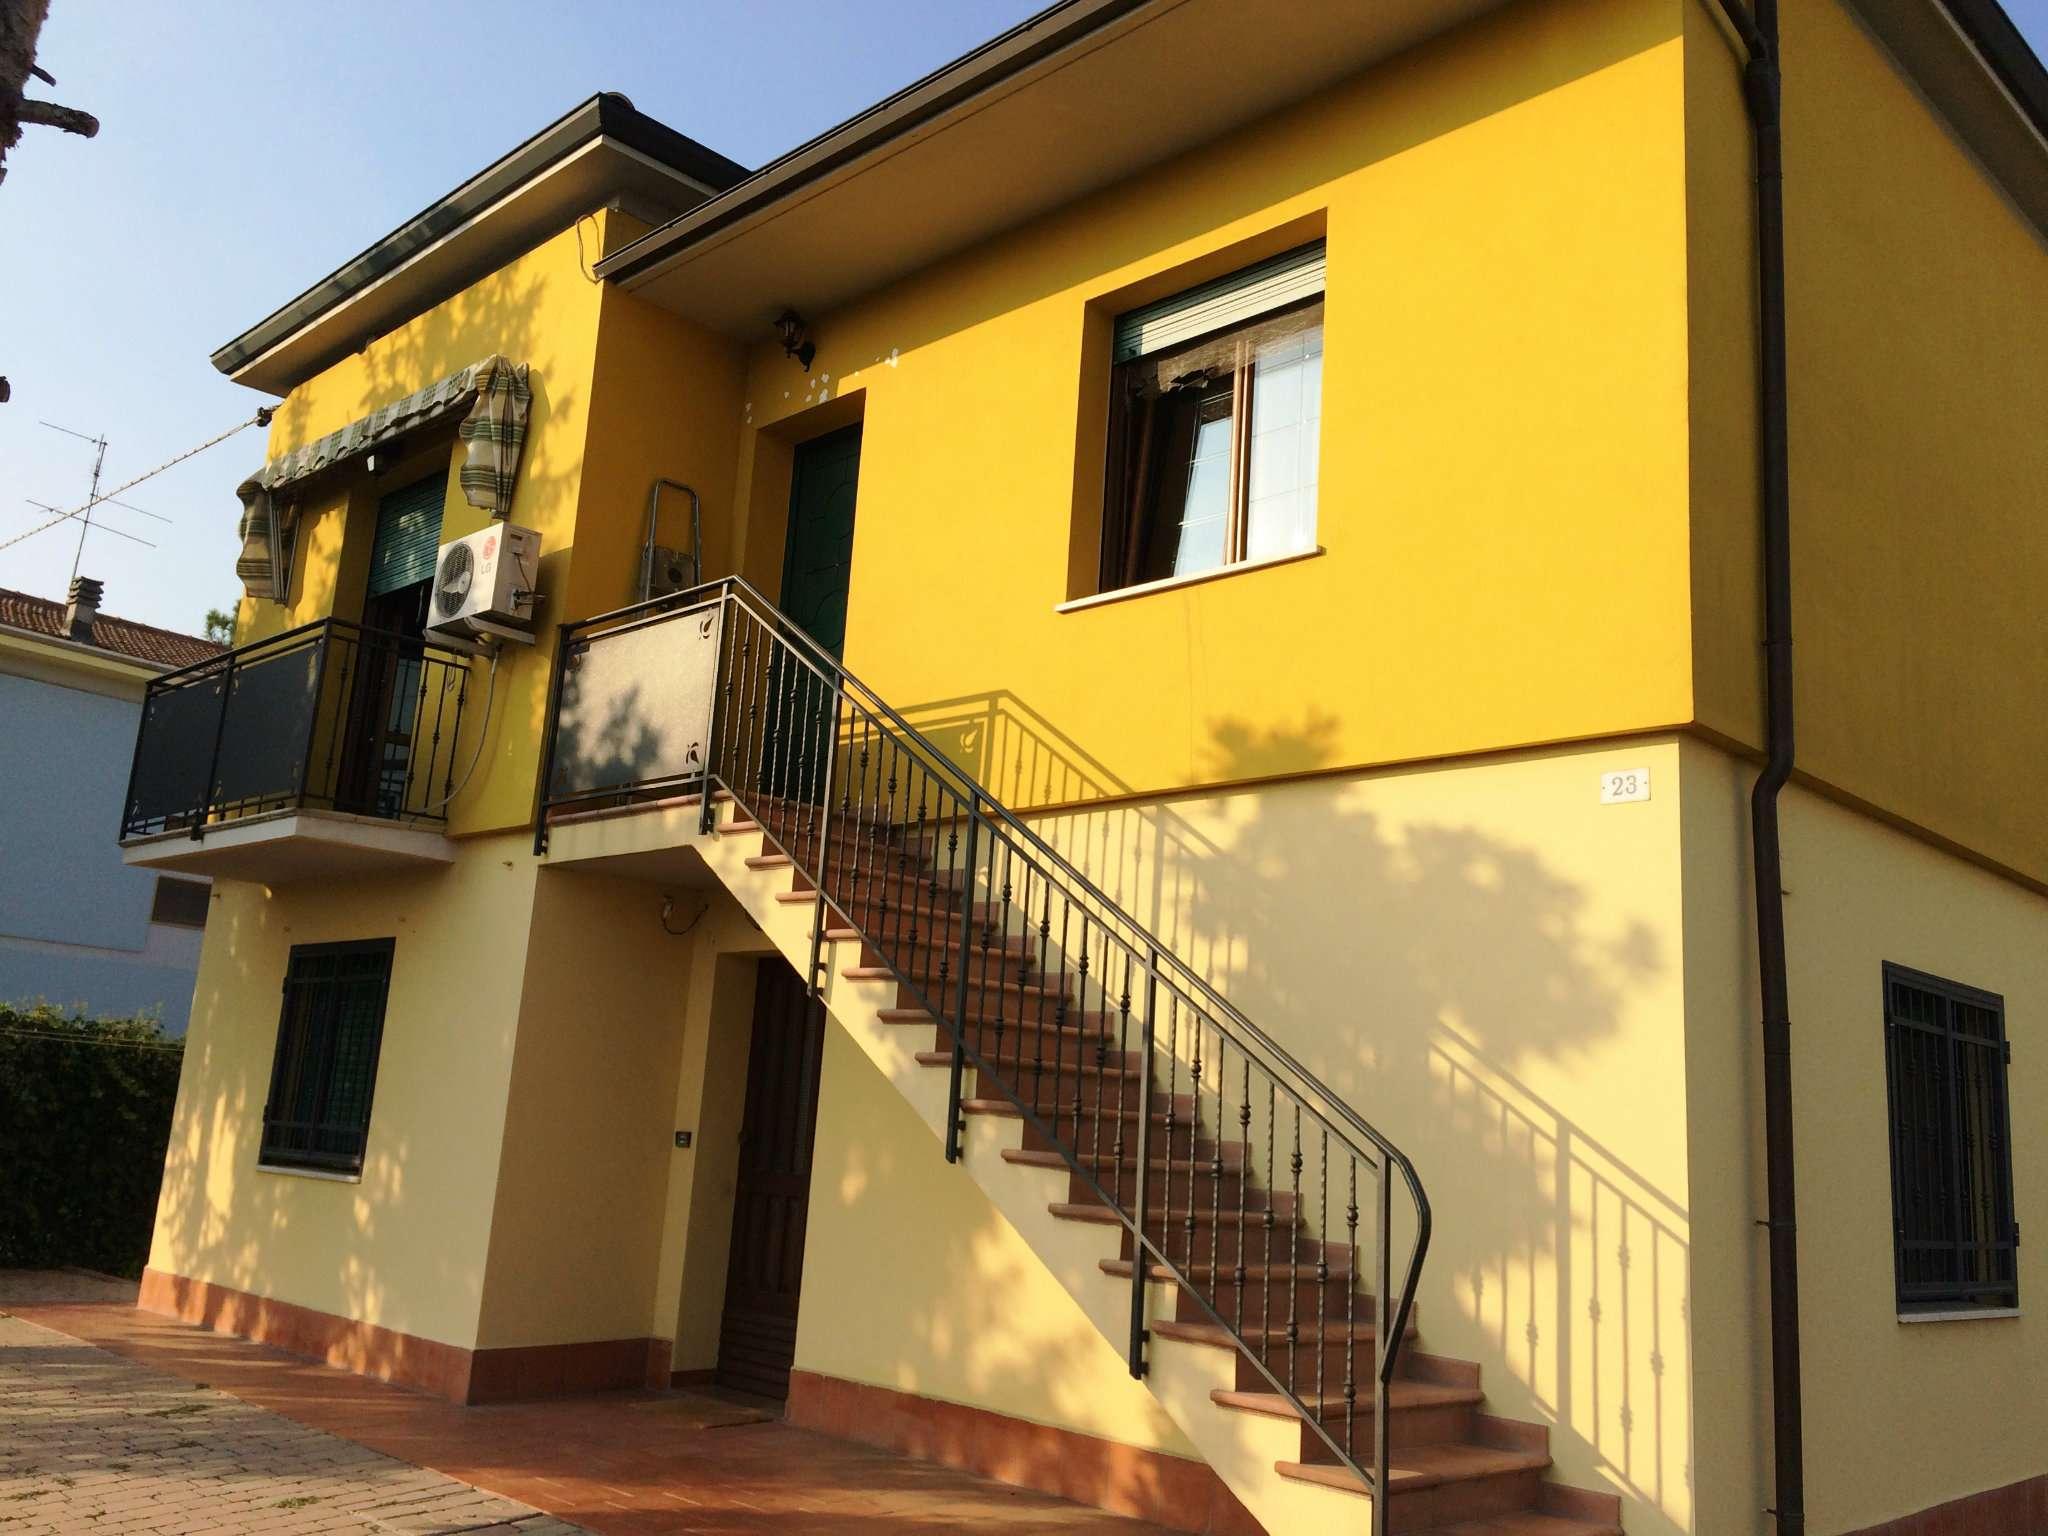 Ampio appartamento indipendente con balcone, autorimessa e cantina